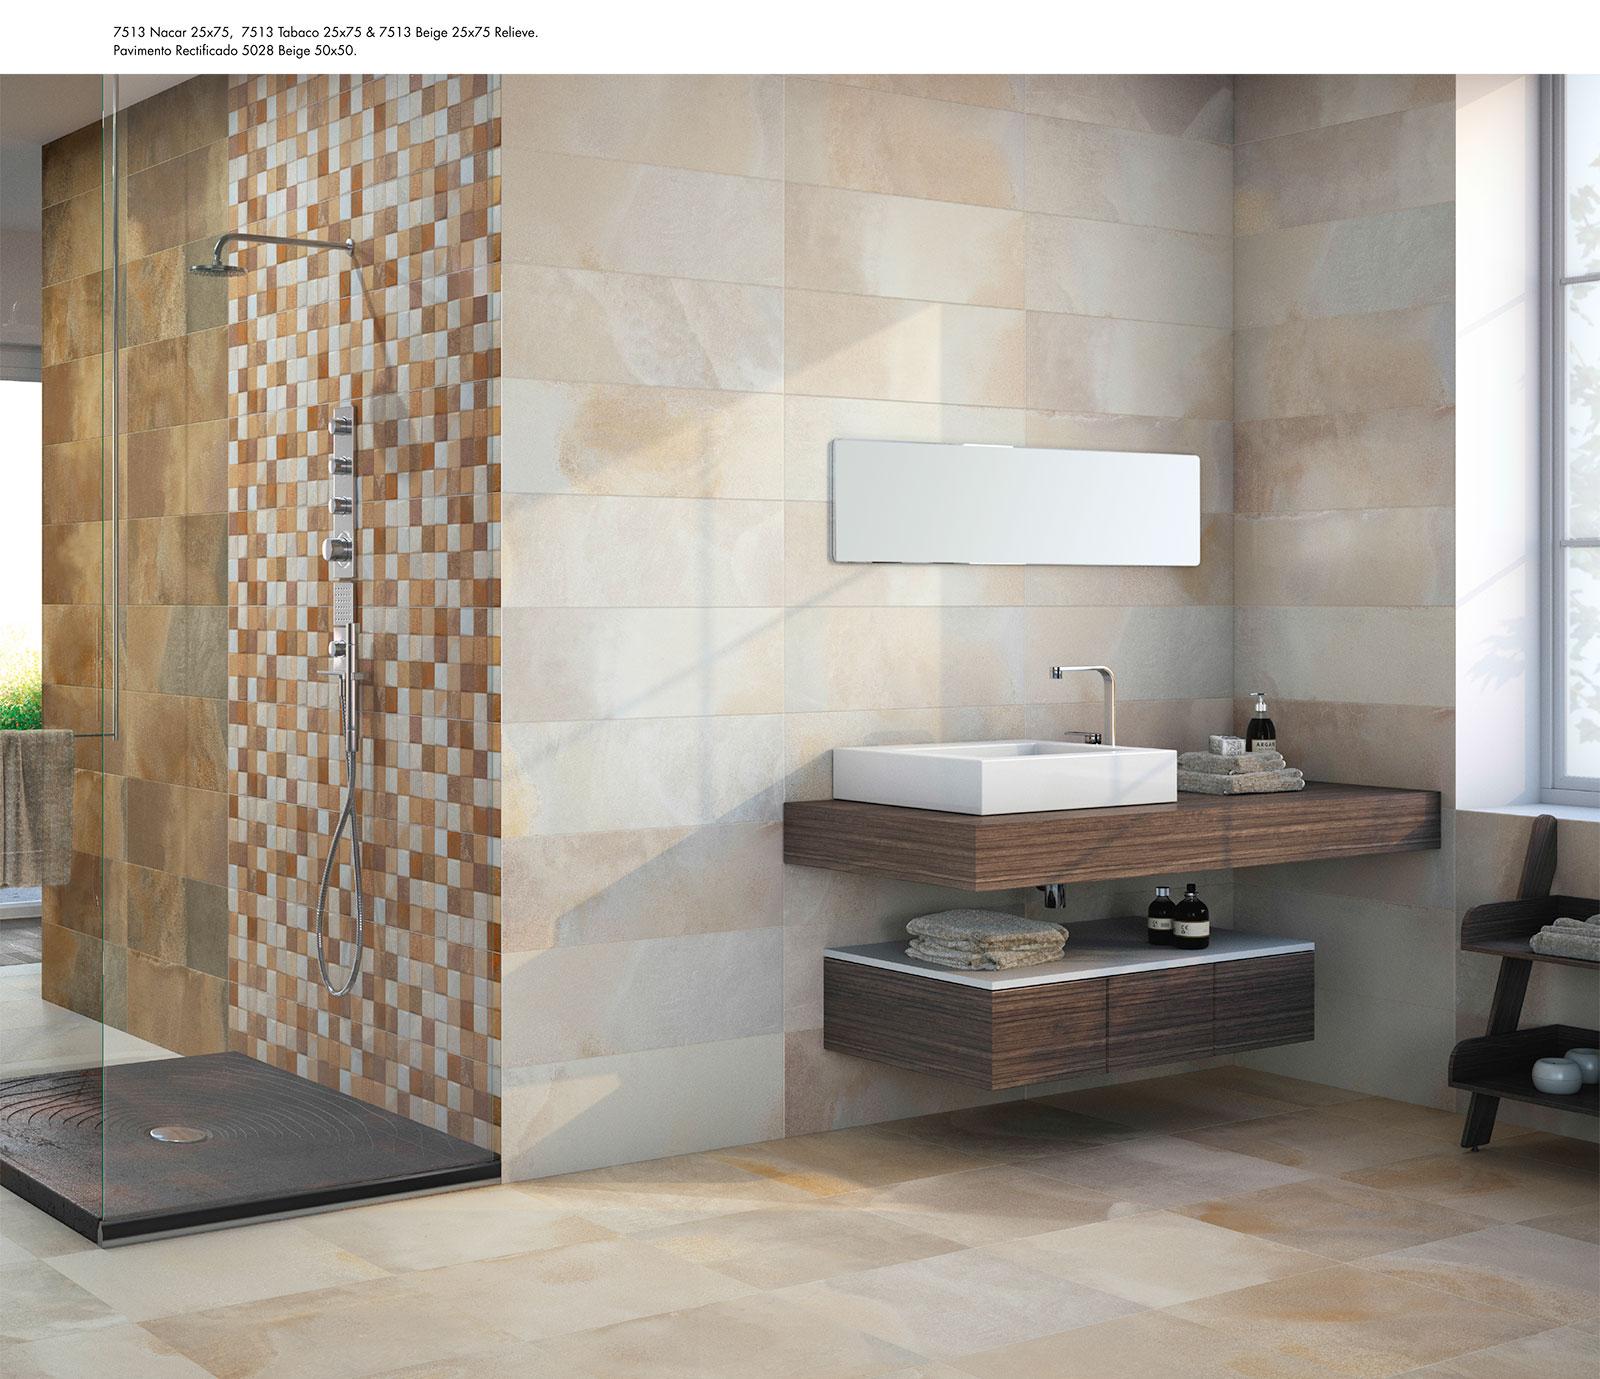 Serie 25x75 7513 azulejos y pavimentos mart n for Azulejos y pavimentos san juan